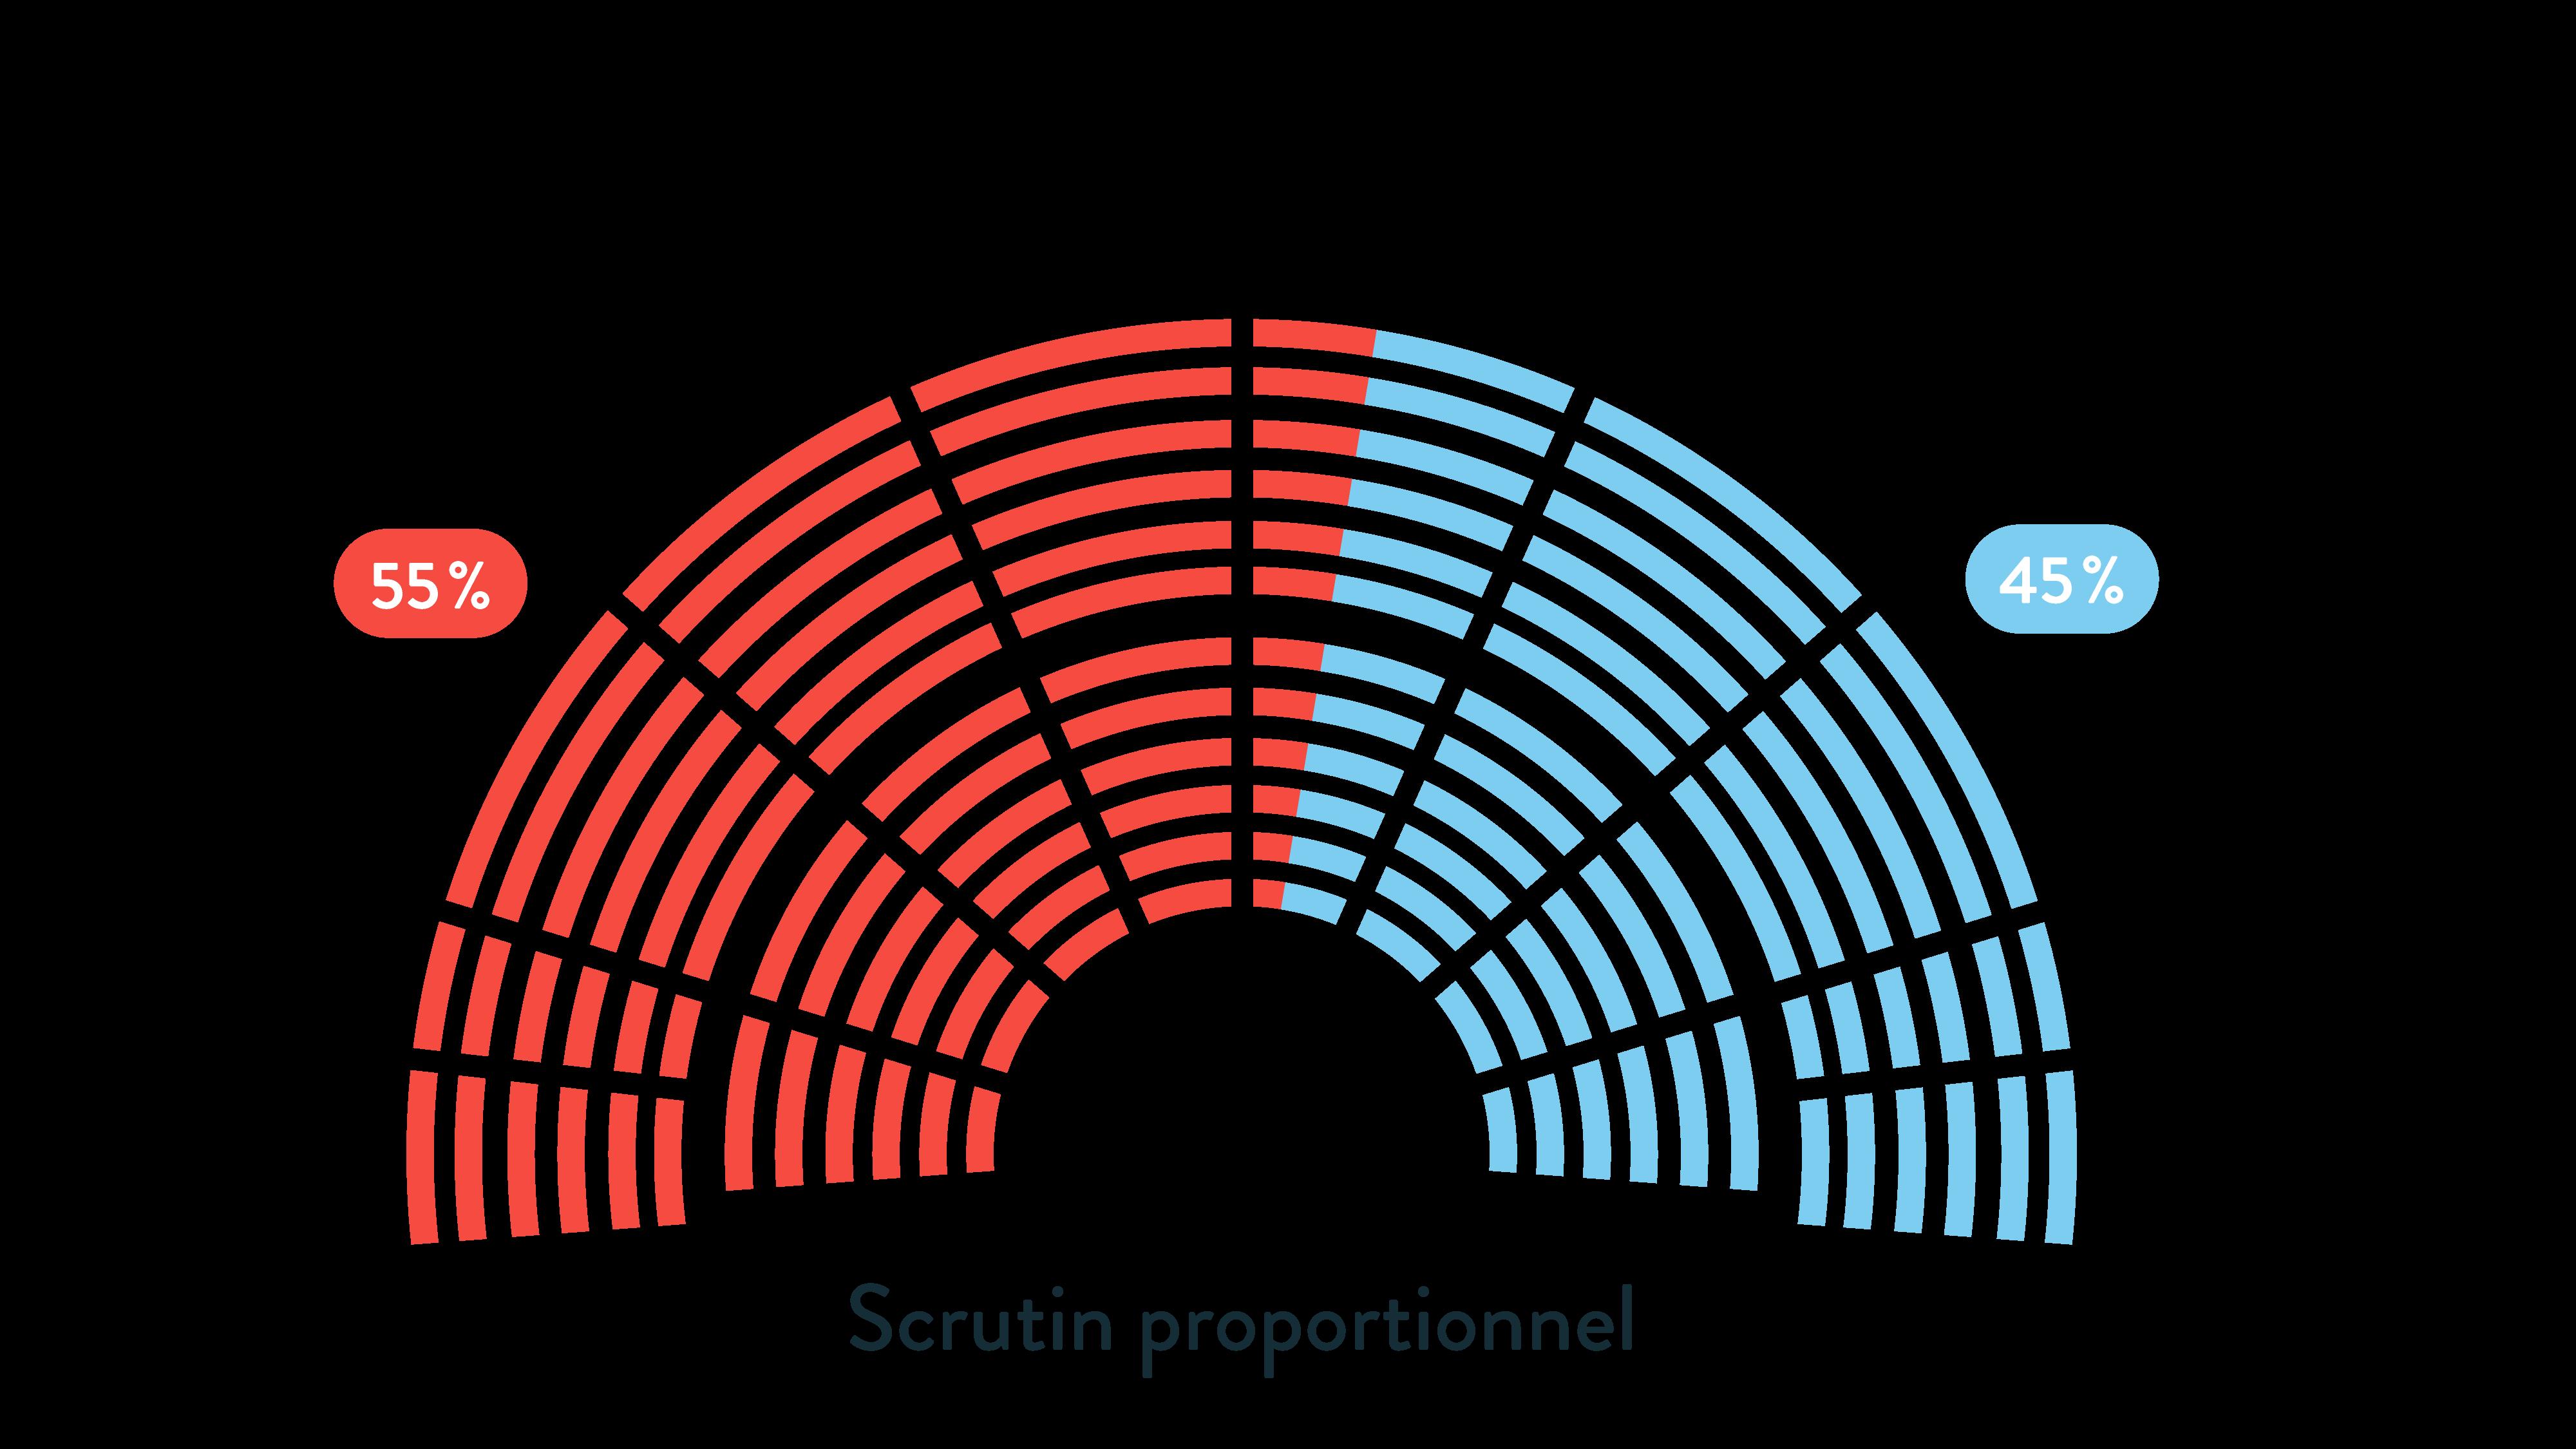 Le scrutin proportionnel ses terminale